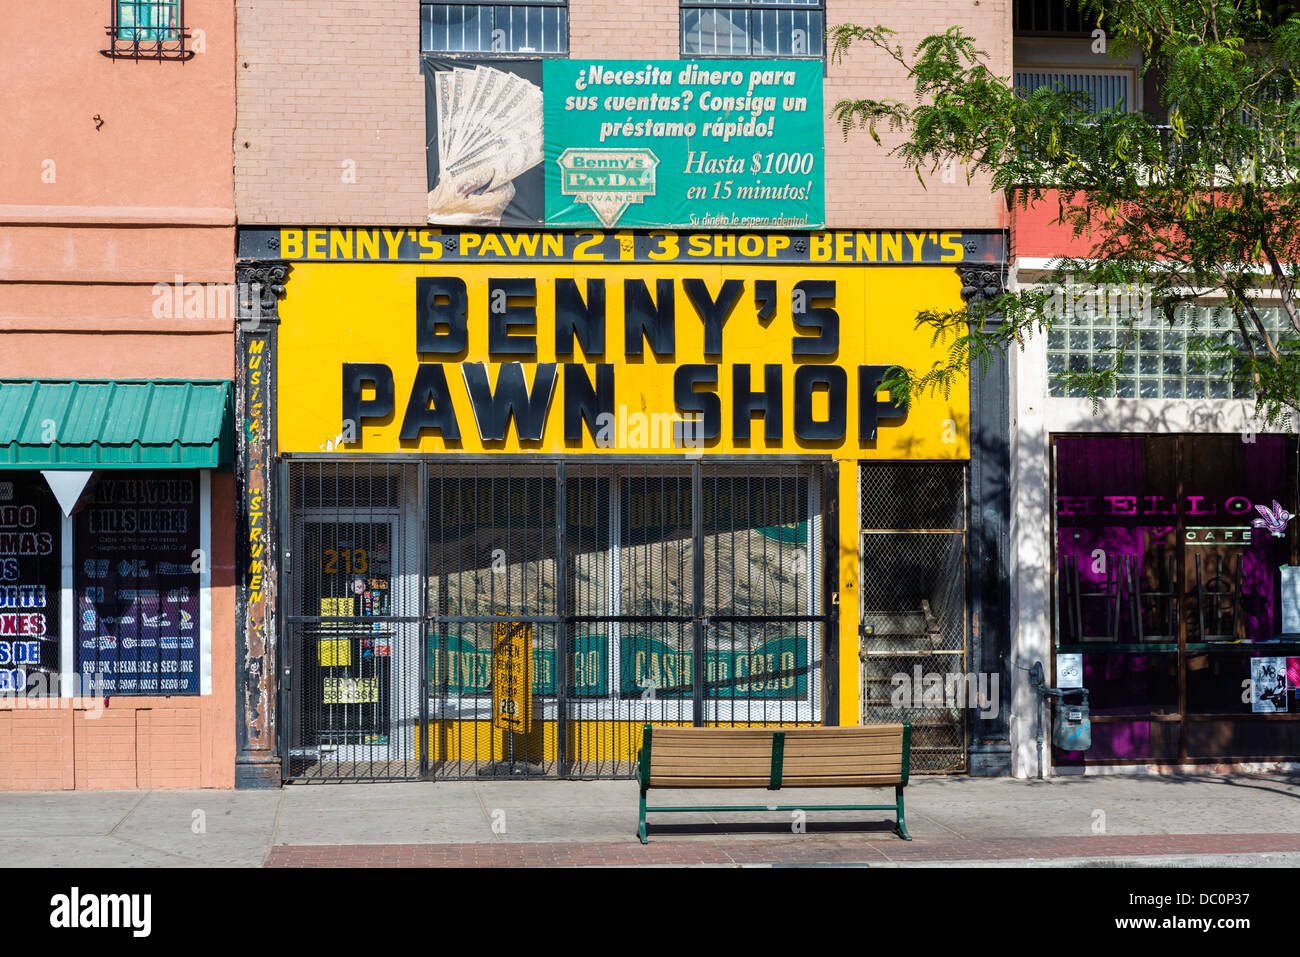 Pawn Shop in El Paso, Texas, USA - Stock Image